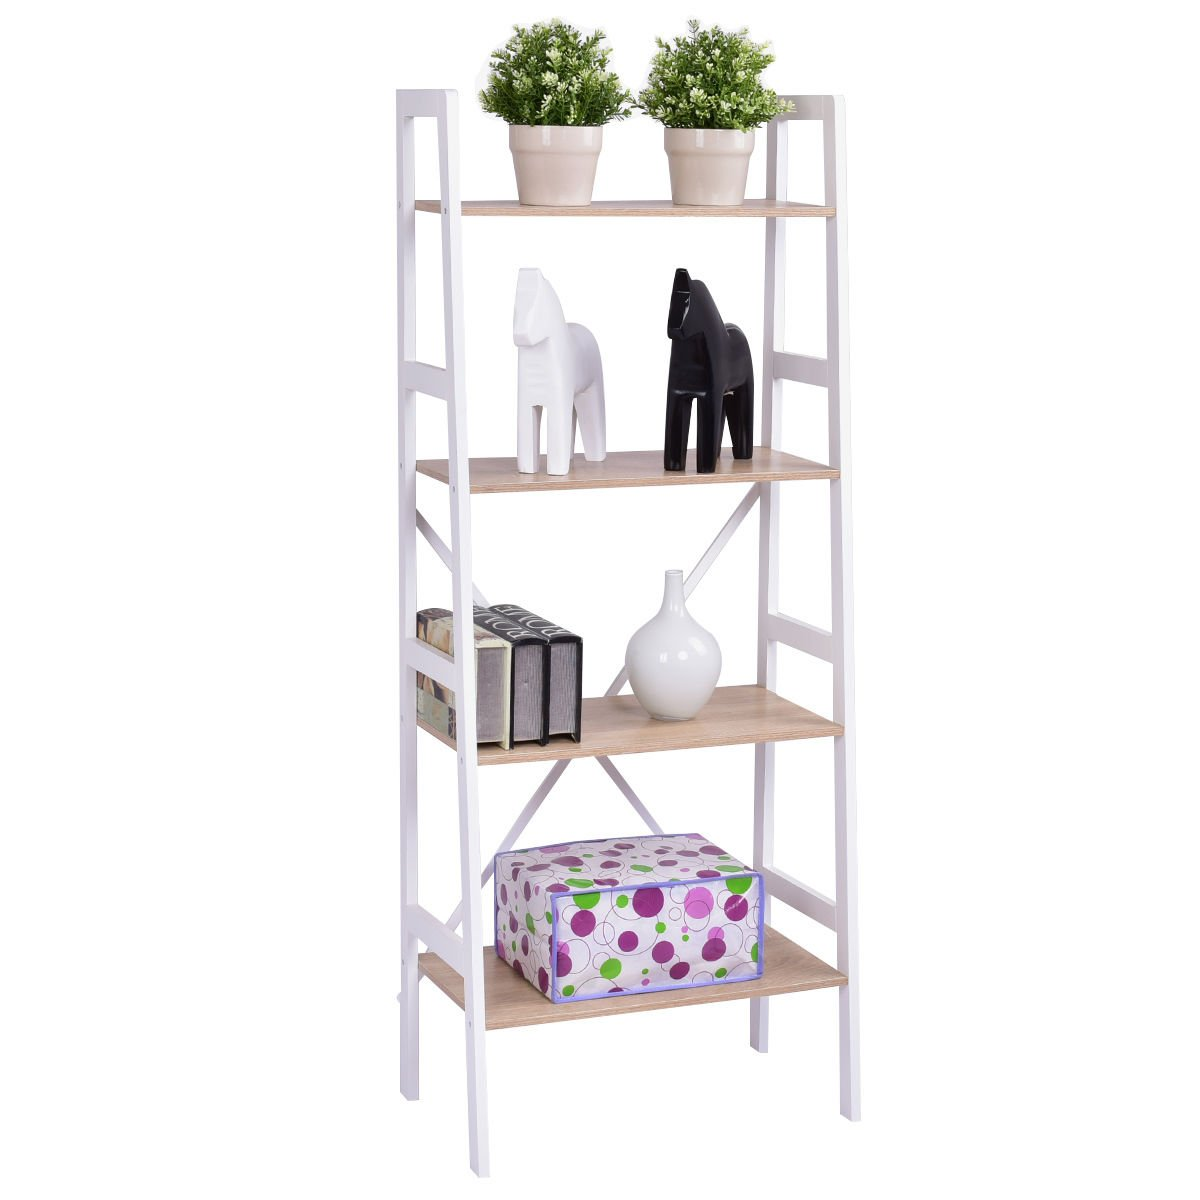 Giantex 3 Tier Bookshelf Bookcase Ladder Wall Stand Storage Shelves Book Rack HW55484